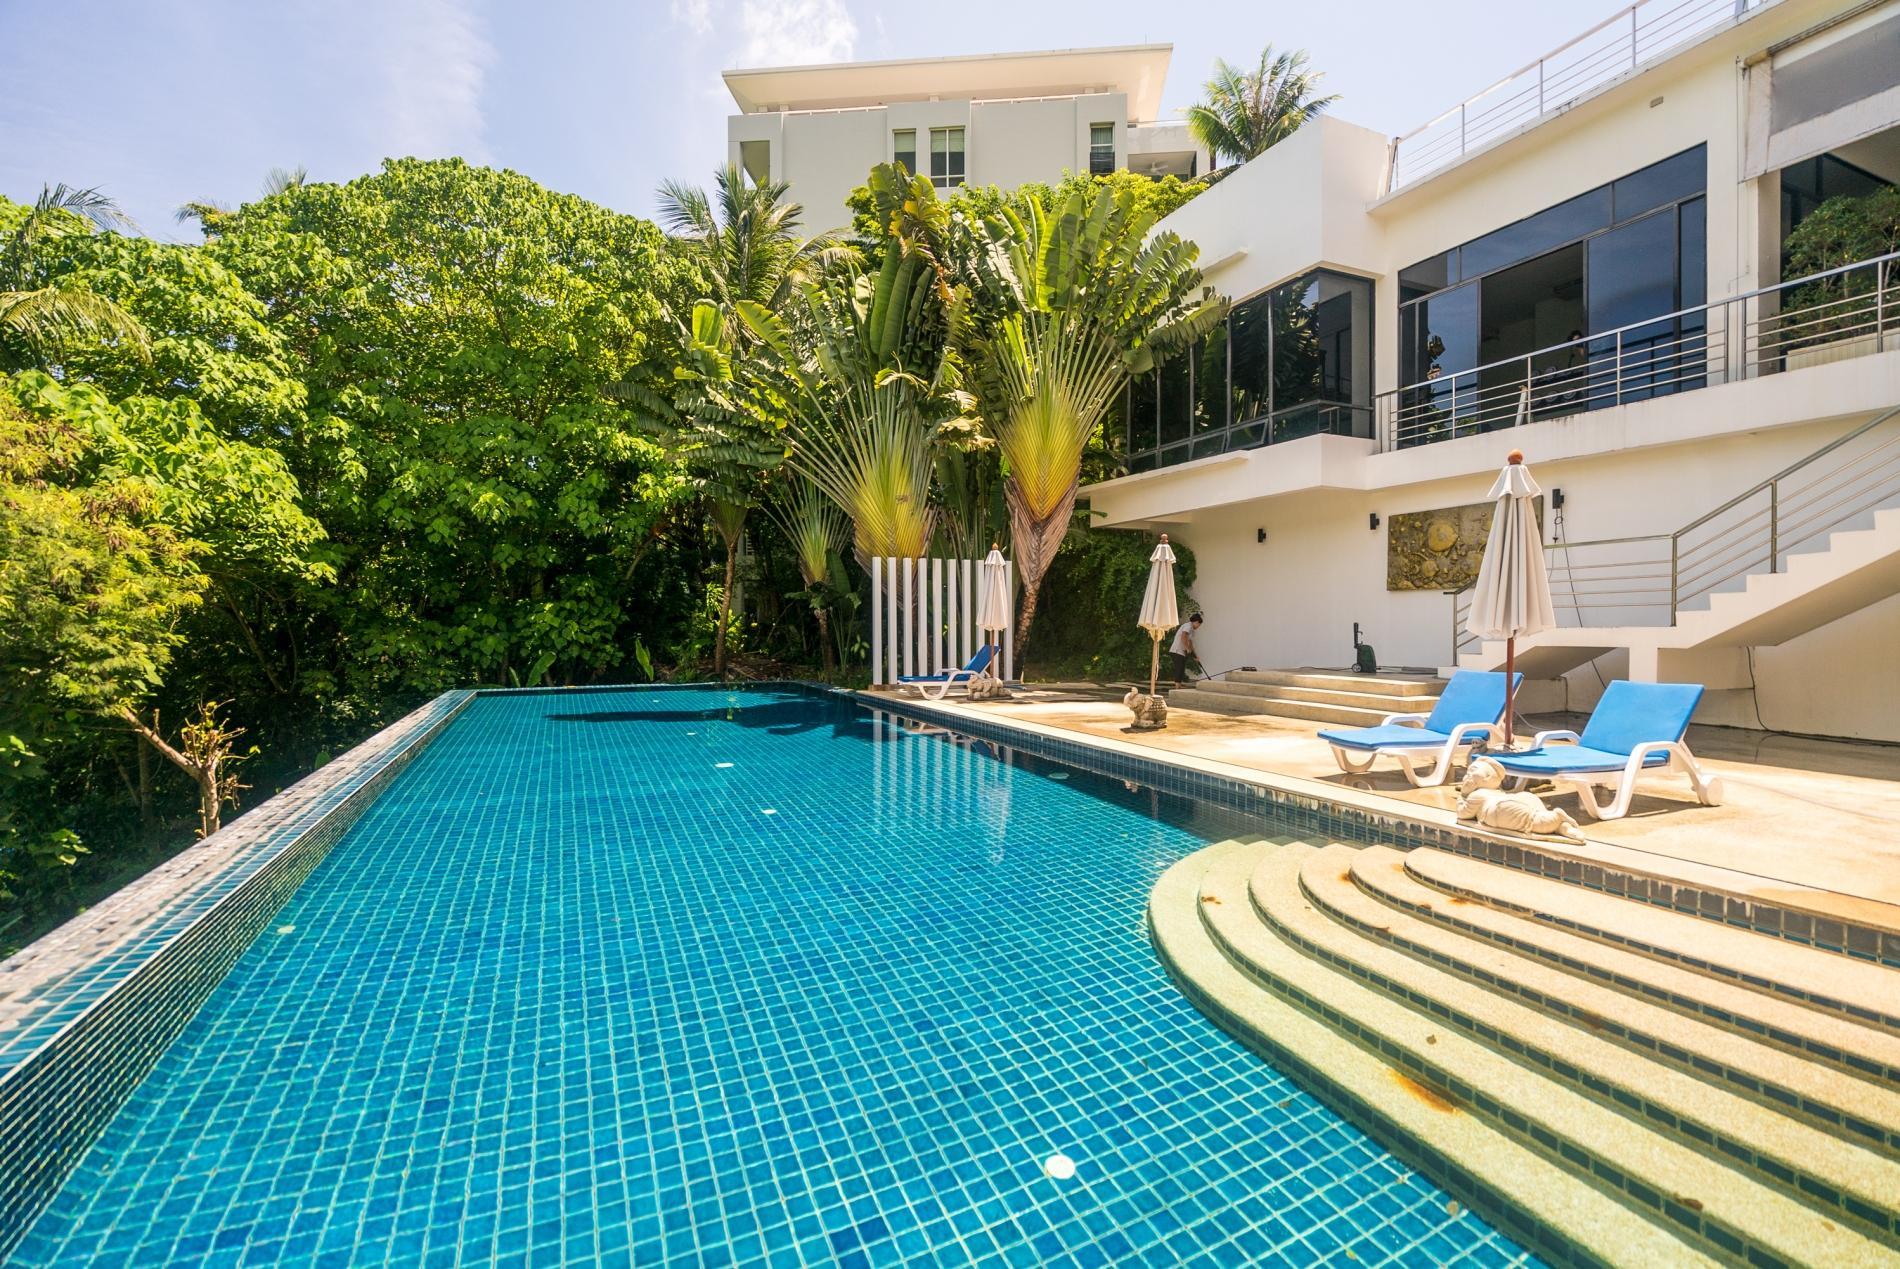 Apartment KH2605 - Sea-view Penthouse in Karon  walk to beach  restaurants  bars  shops photo 18884542